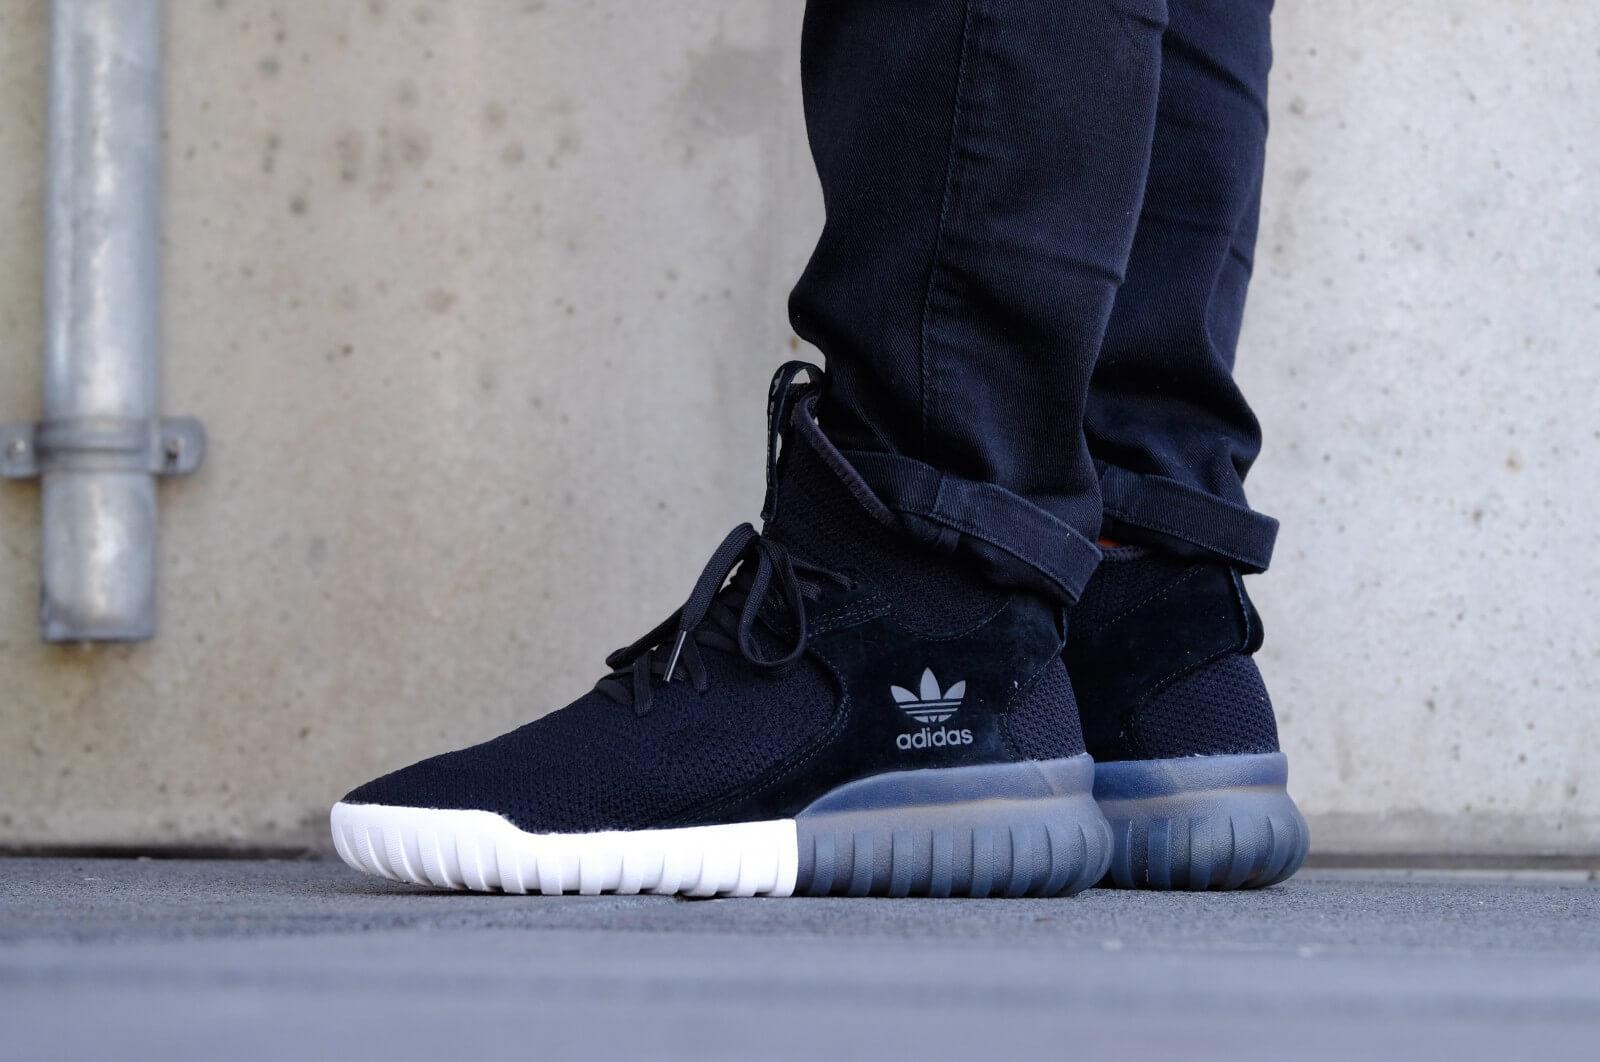 Adidas Tubular X Primeknit Black White -